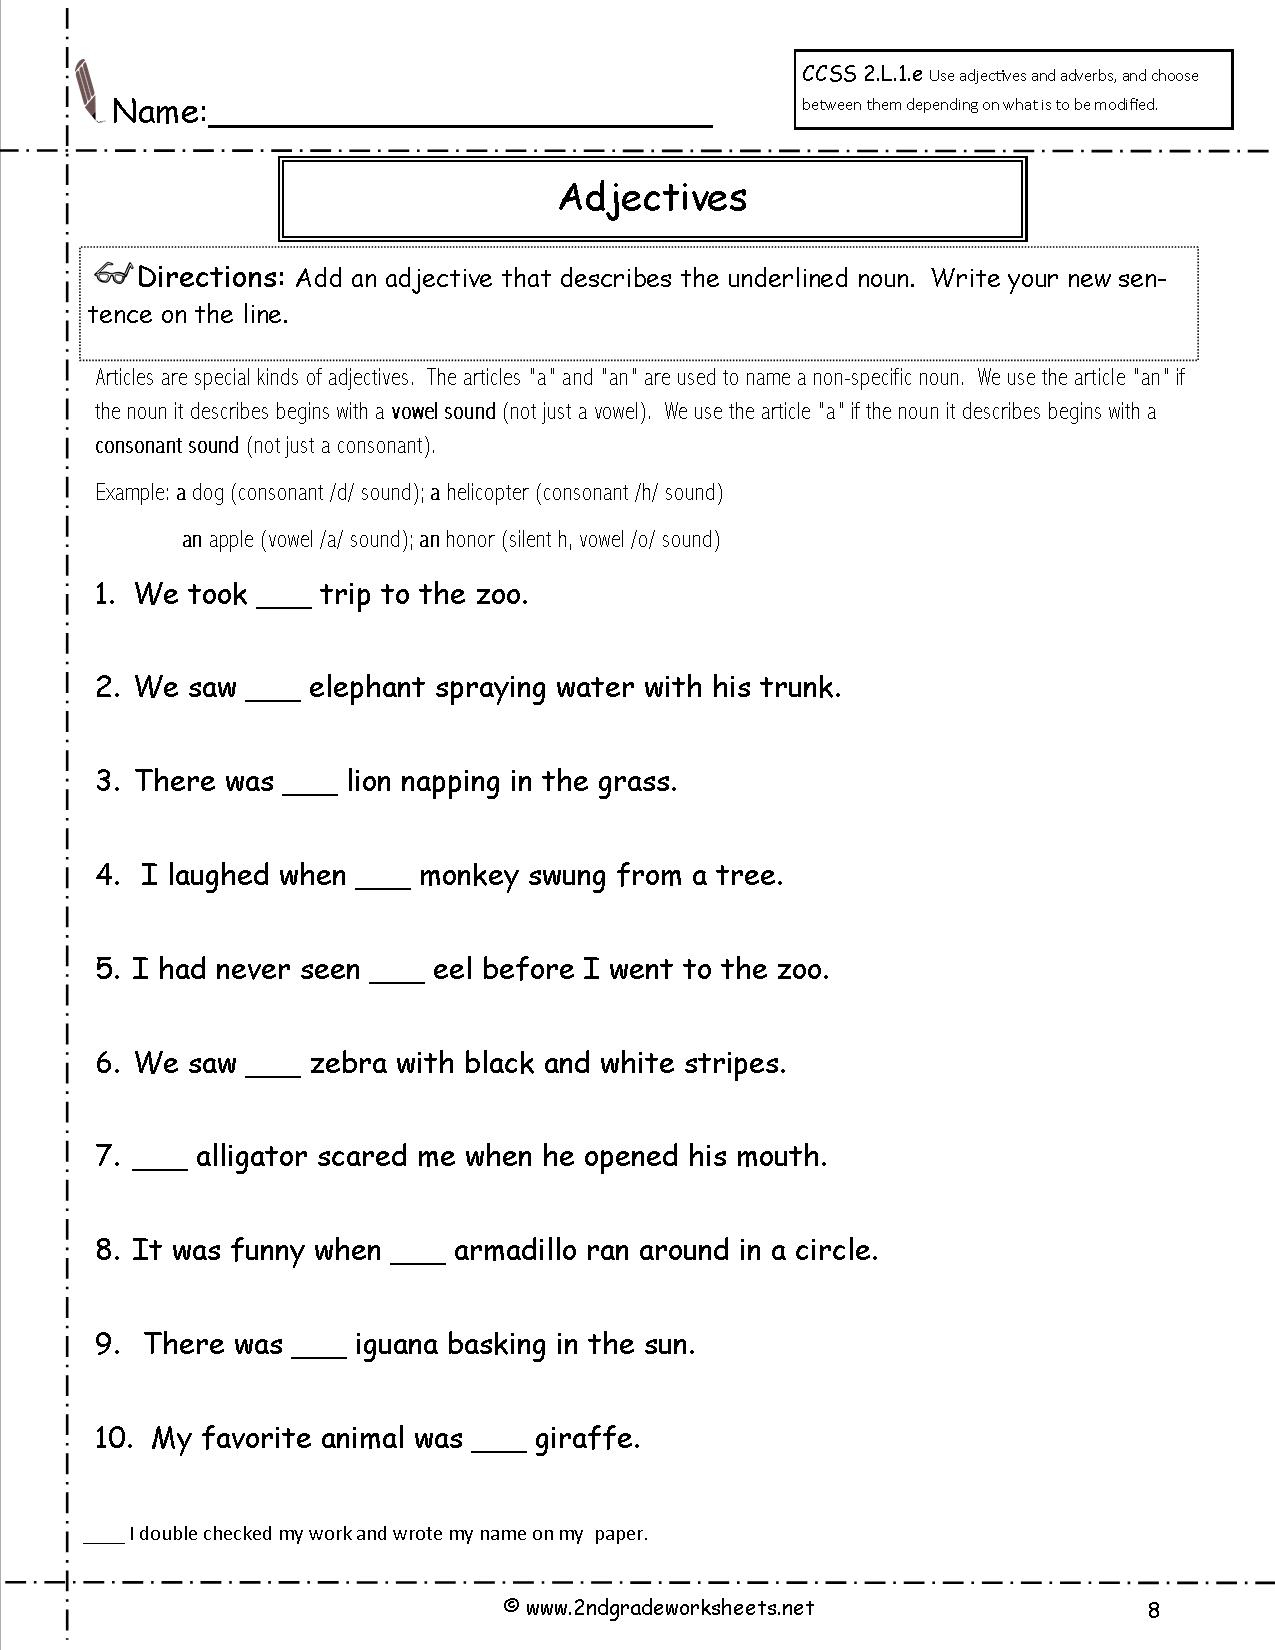 Free Language/grammar Worksheets And Printouts | Free Printable Grammar Worksheets For 2Nd Grade